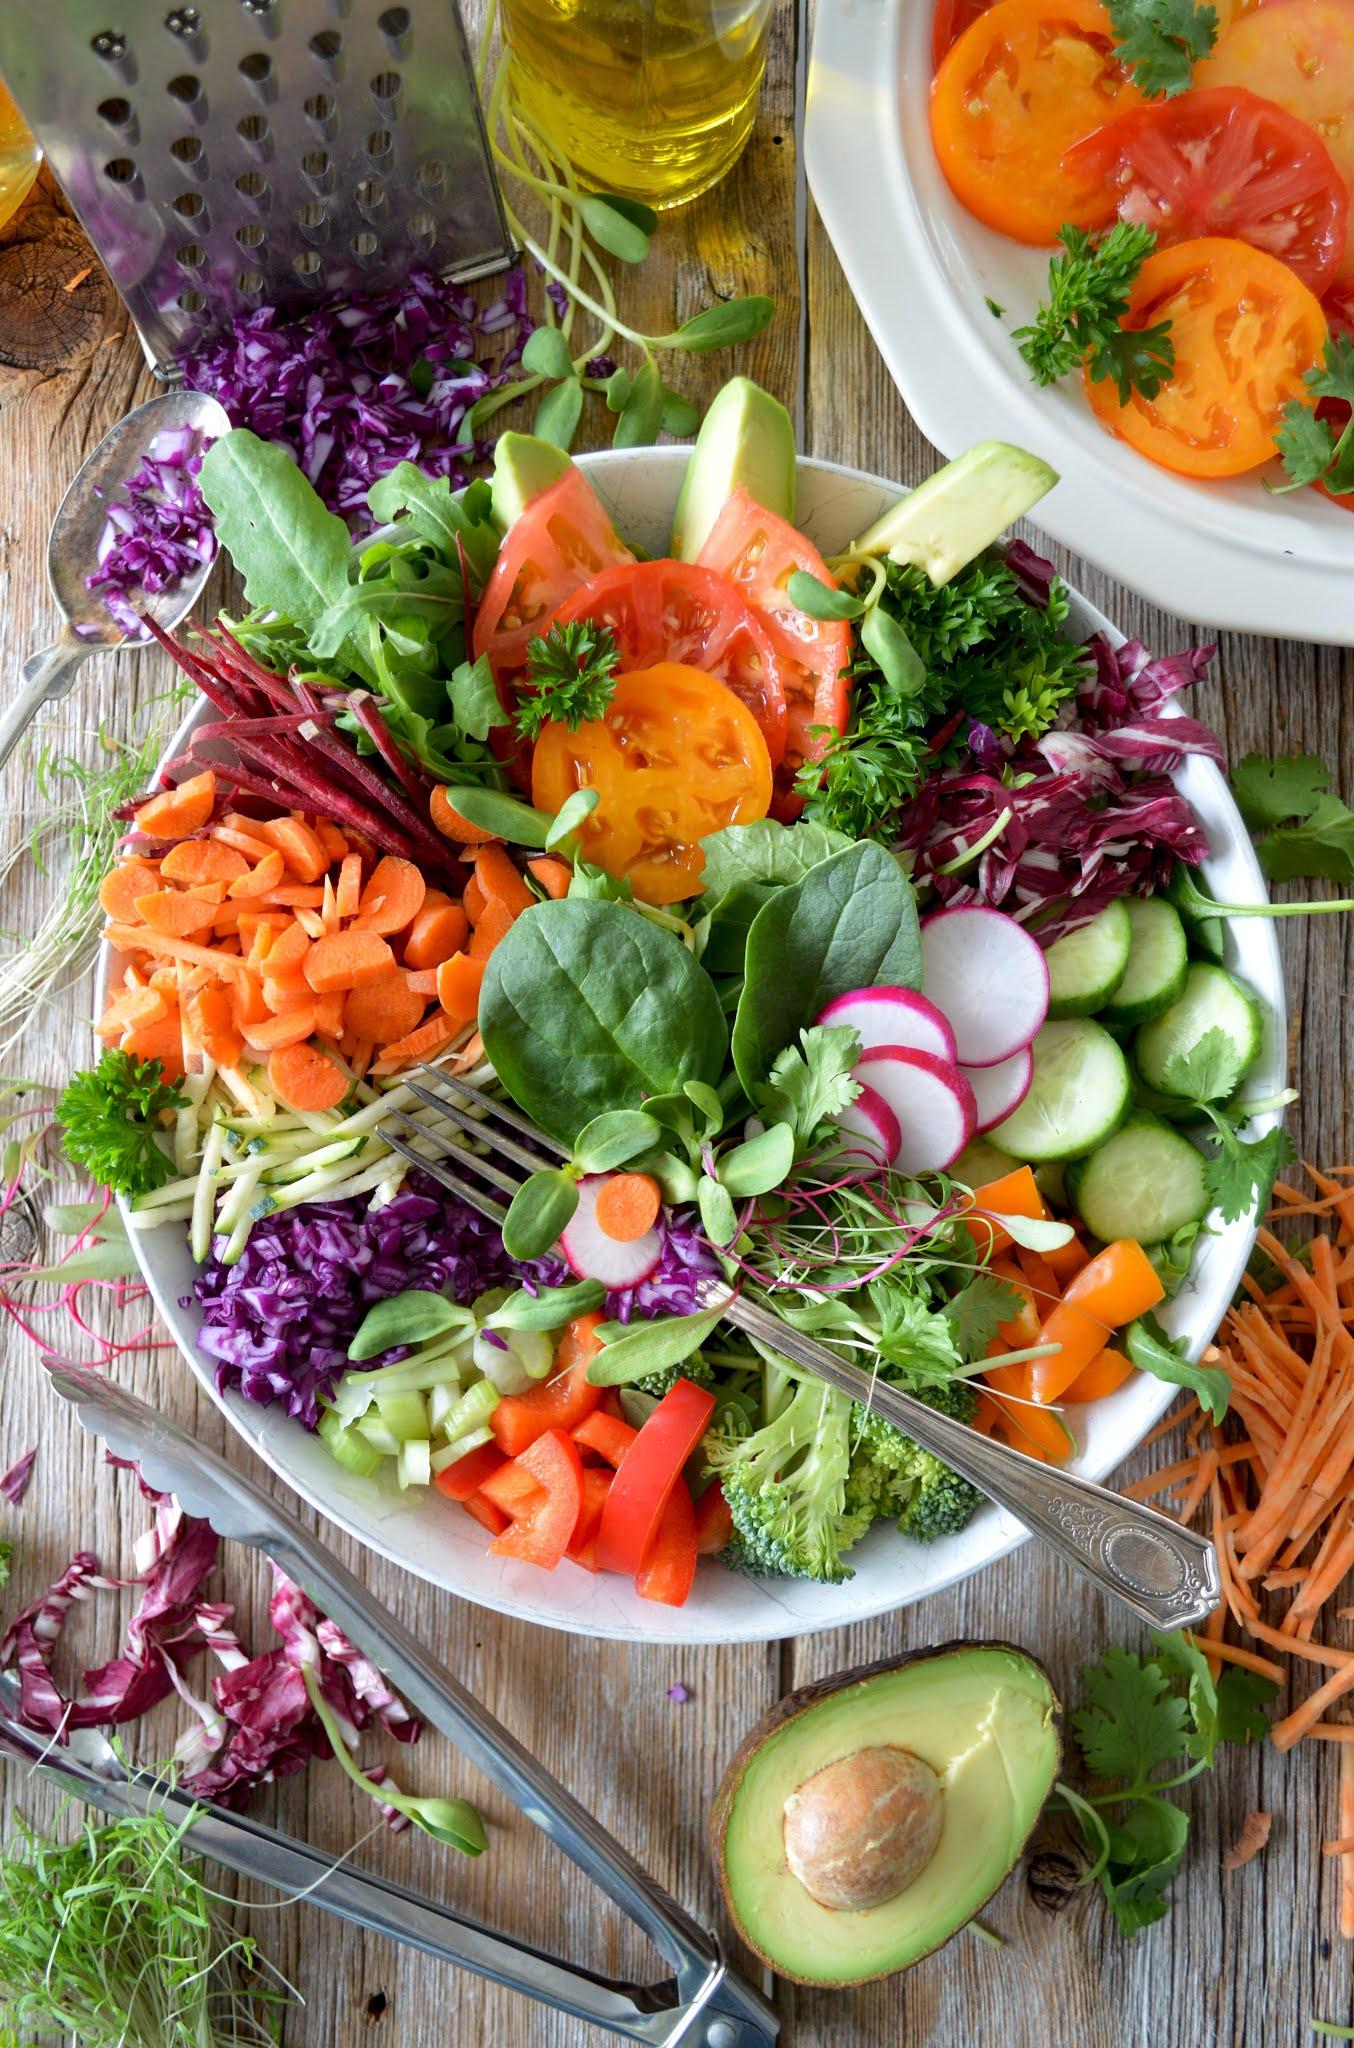 Best diet to lose weight Quickly in 2021